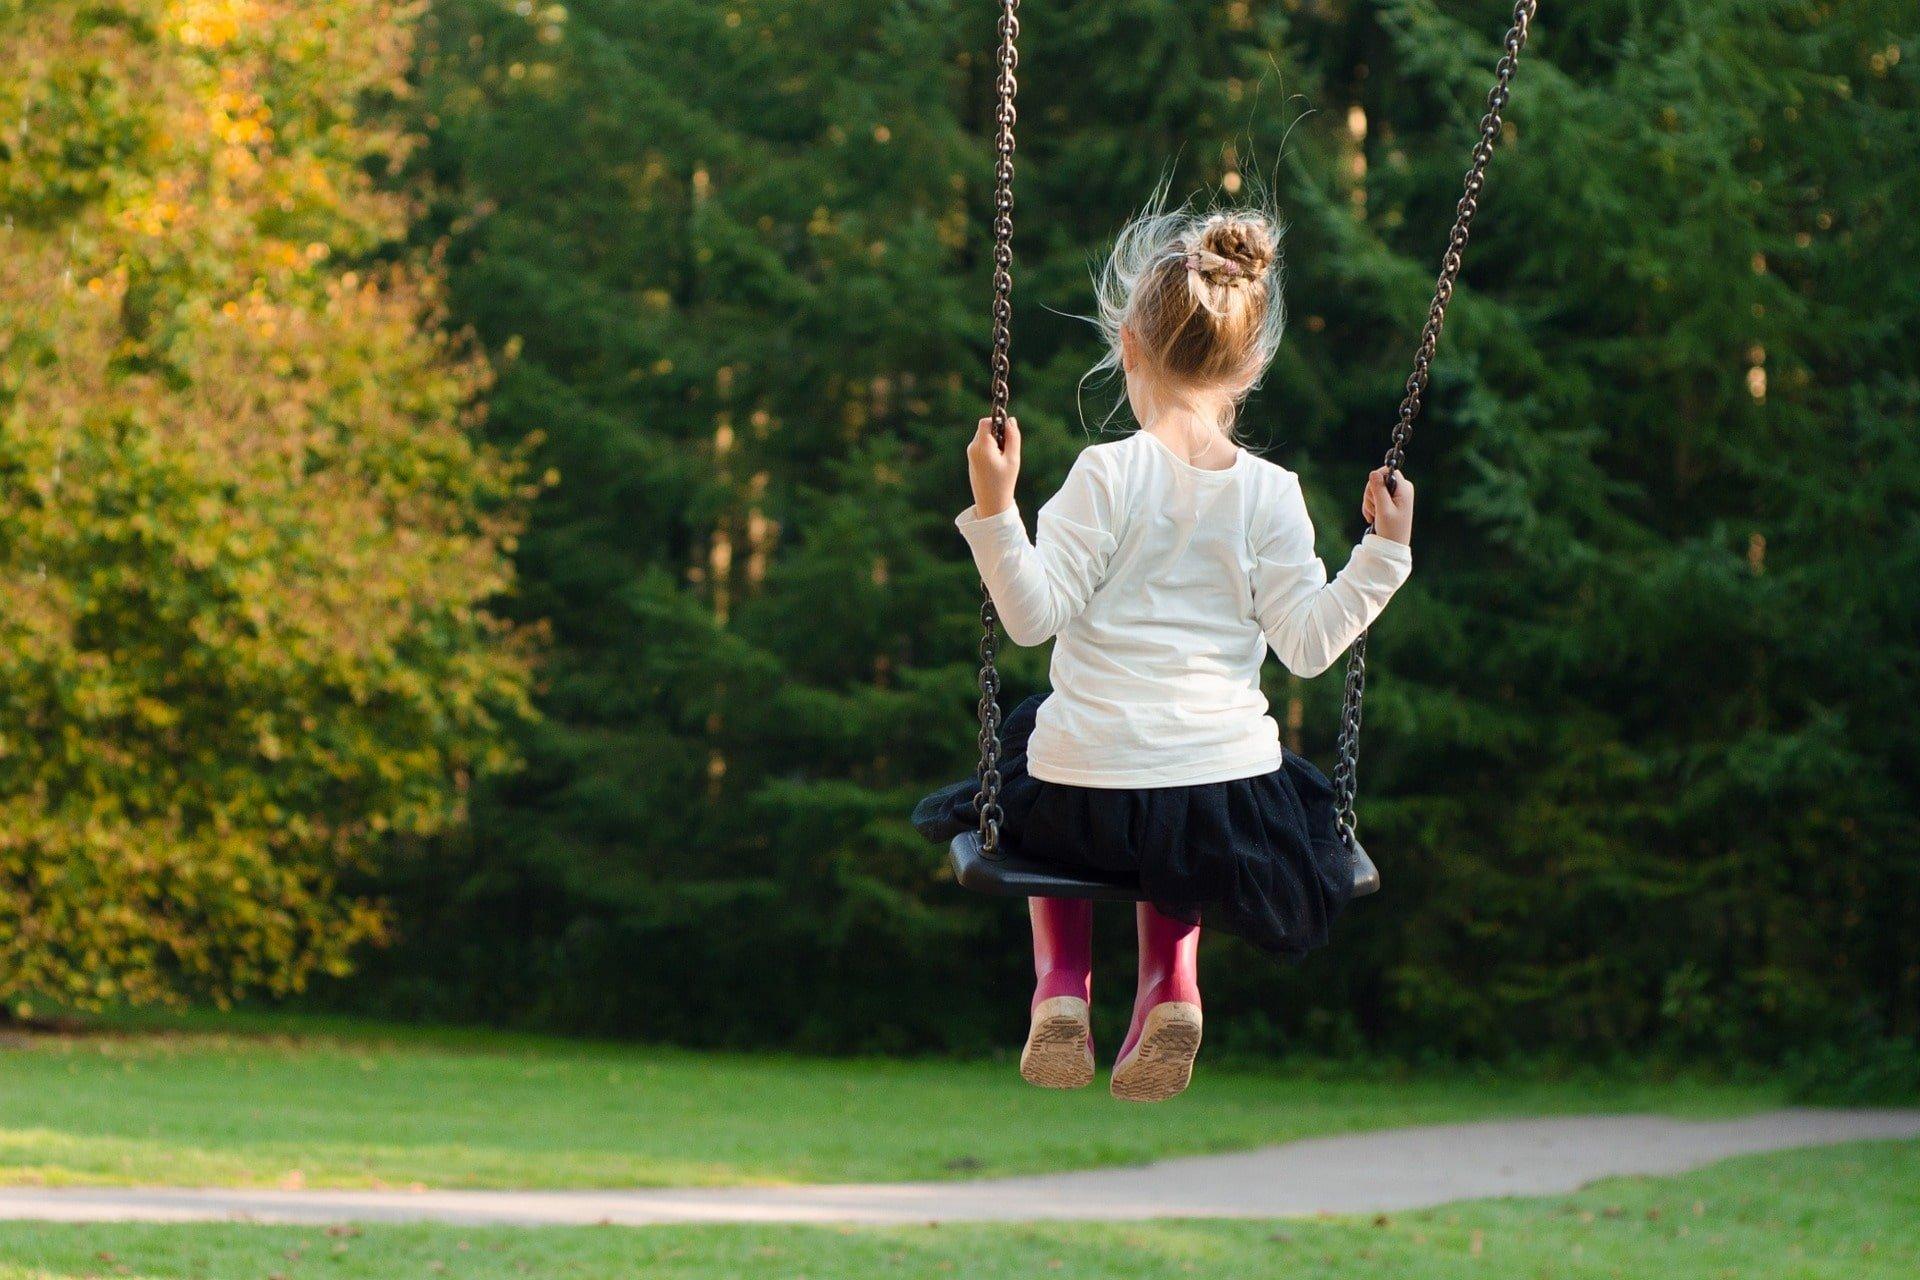 Playgrounds throughout Tauranga for kids